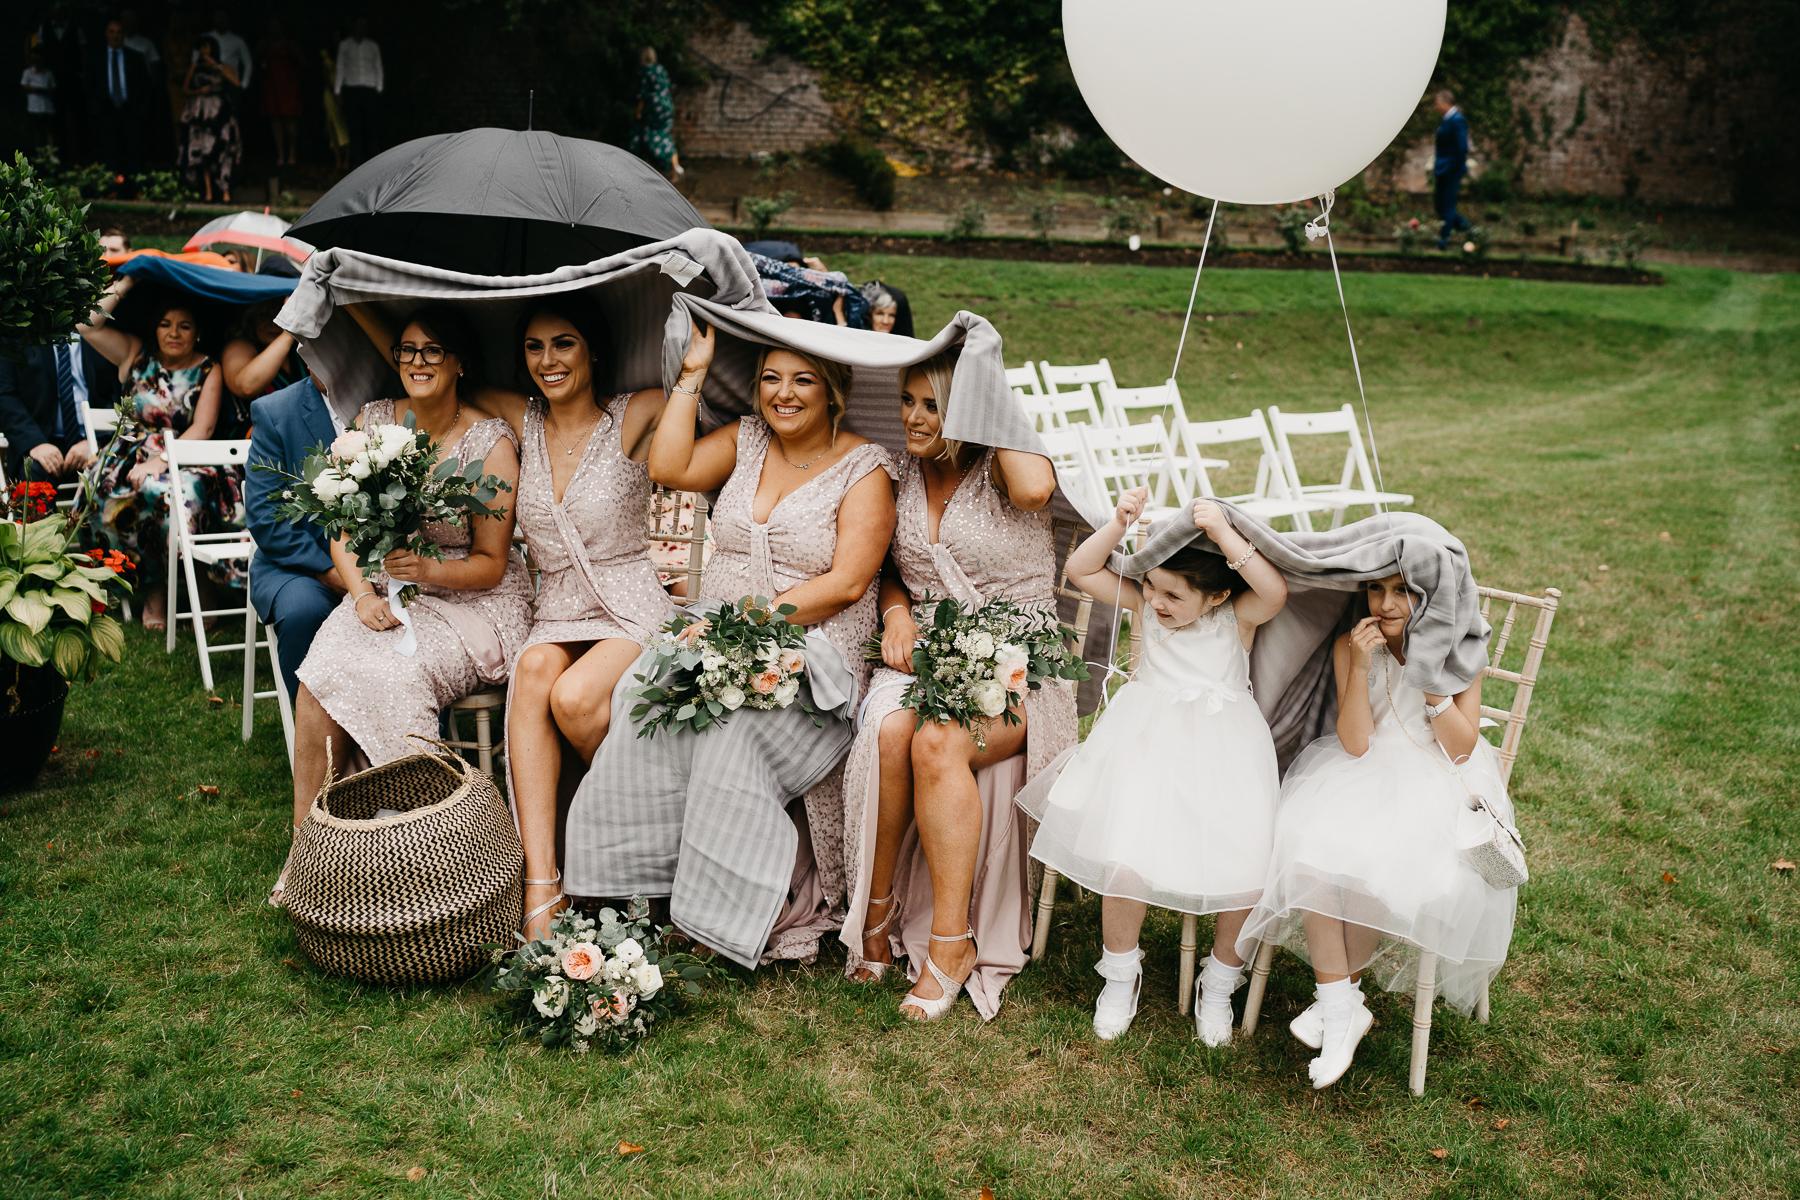 garden-marquee-wedding-ireland-igstudio-photography